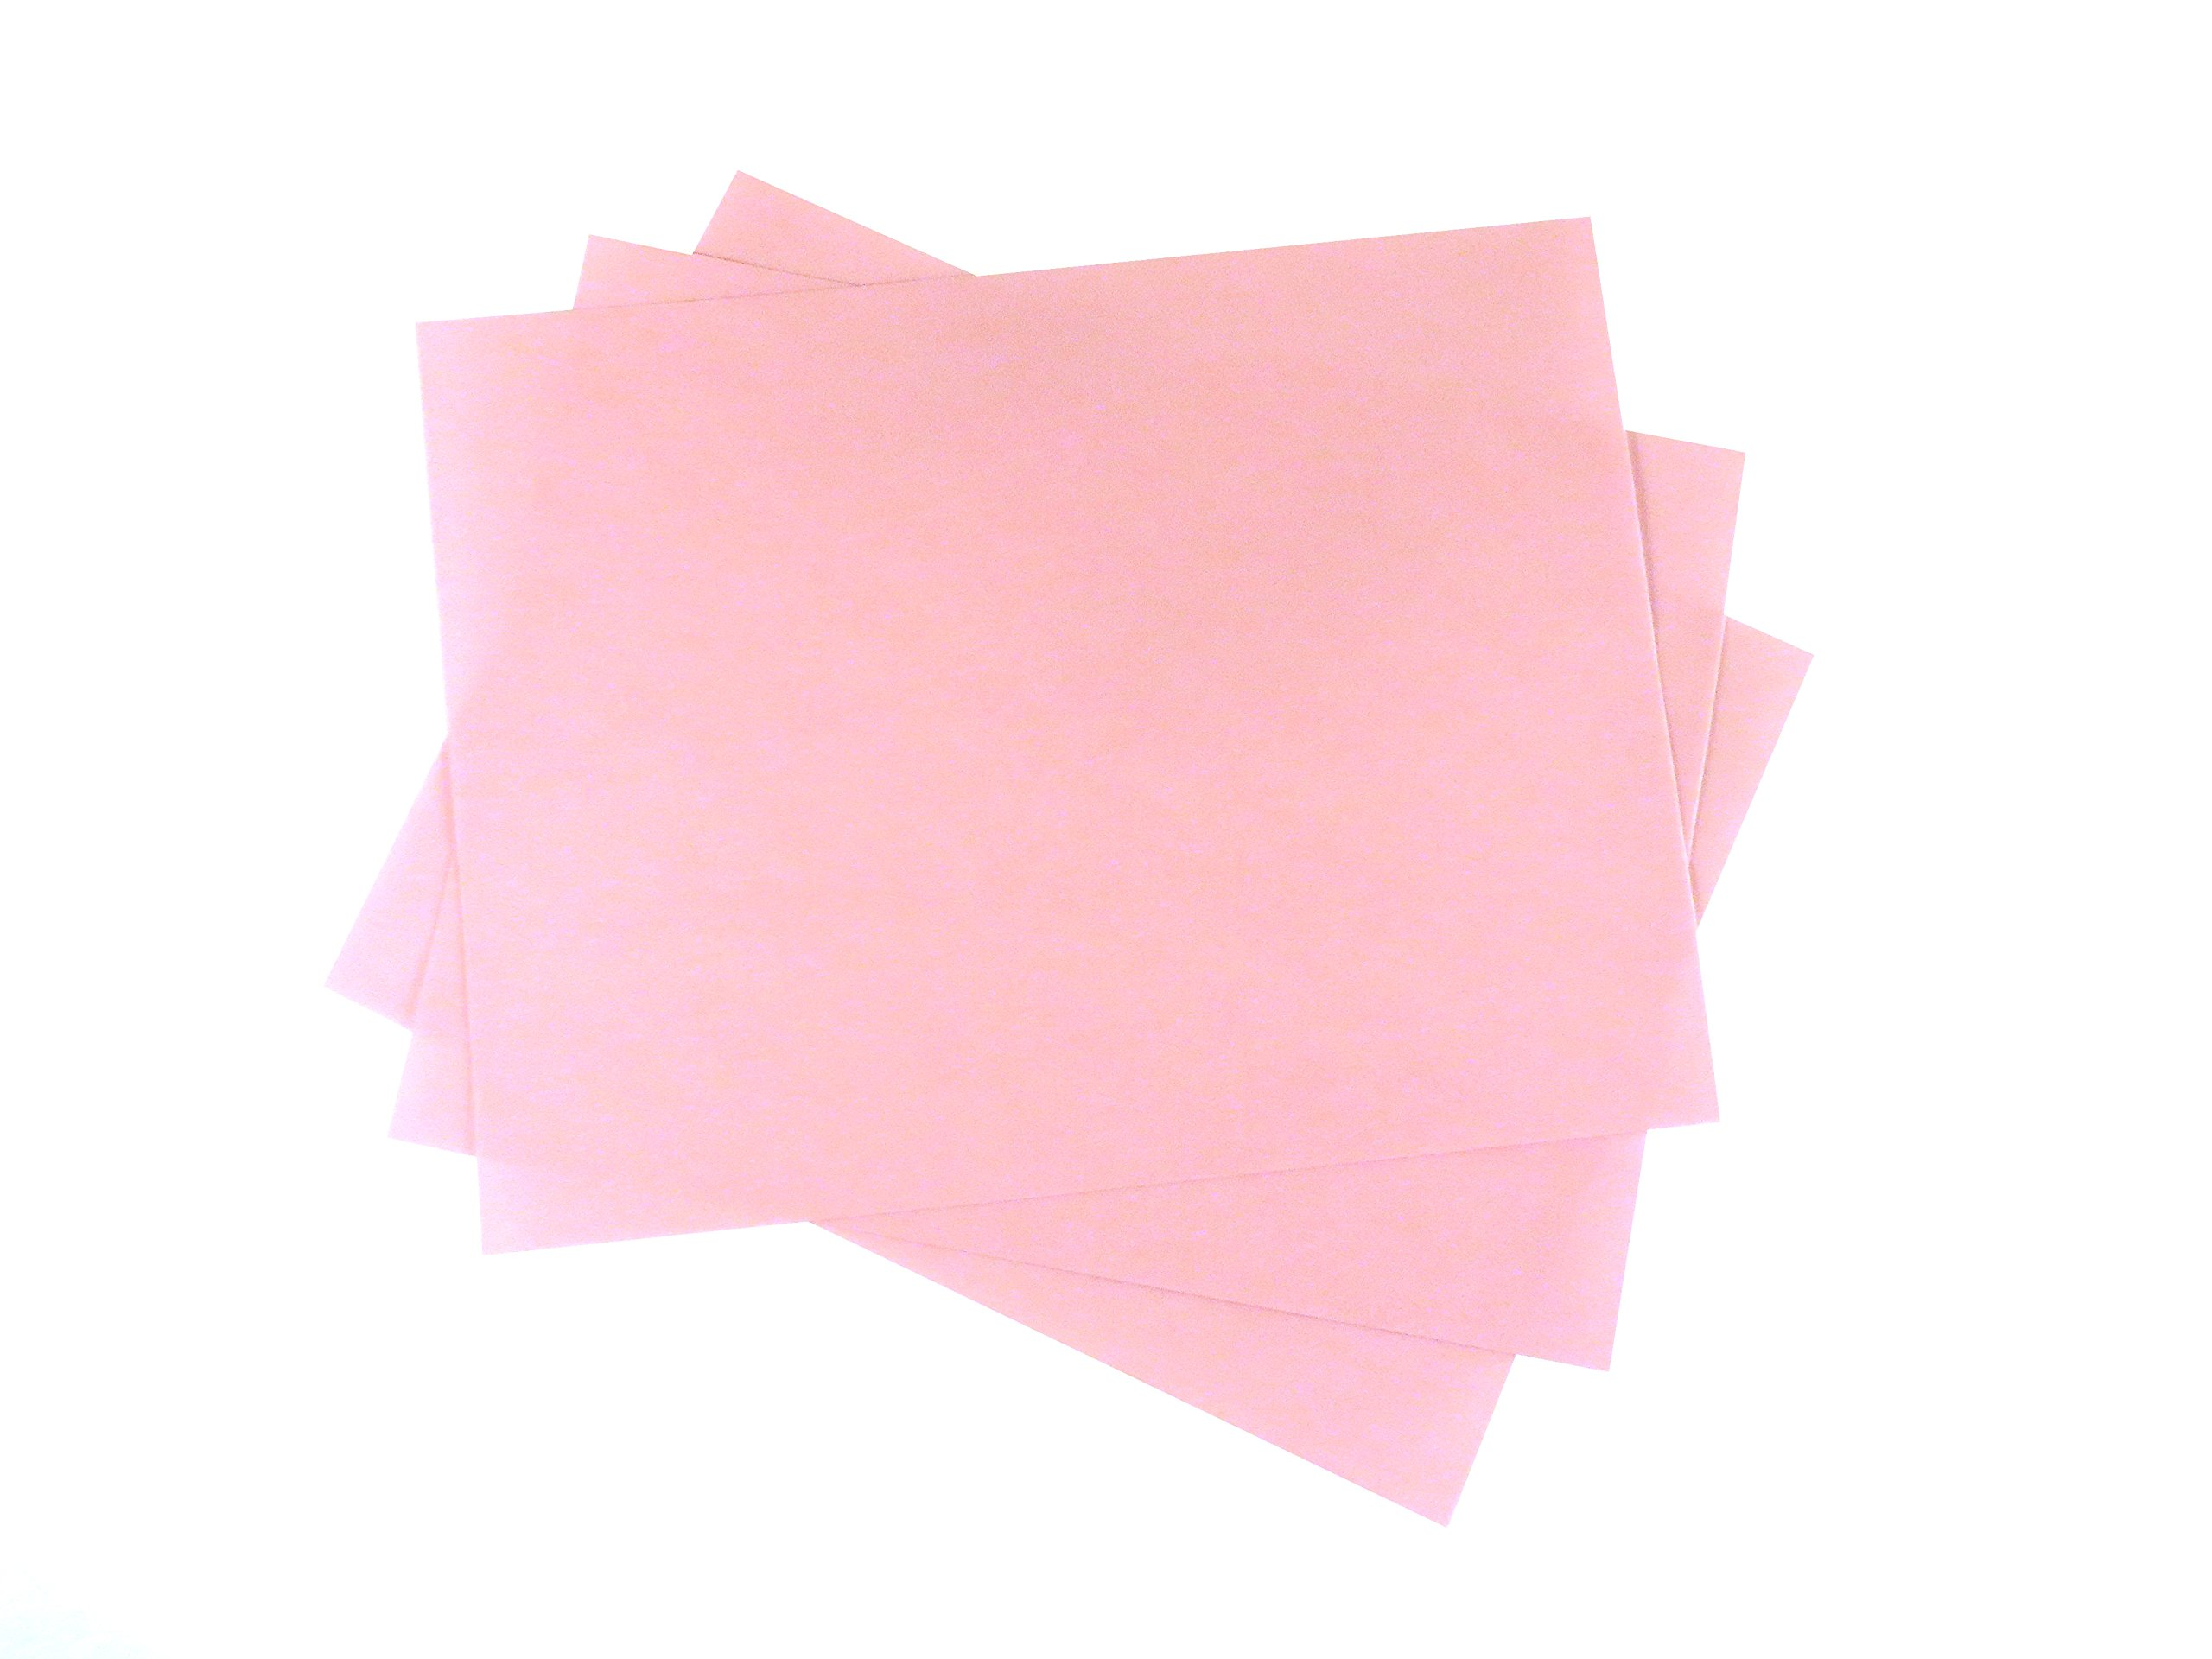 "3 Sheet Bundle 3 Micron (8,000 Grit) PSA Lapping Microfinishing Film Aluminum Oxide (OA) 8 1/2"" x 11"" 266Xx3"